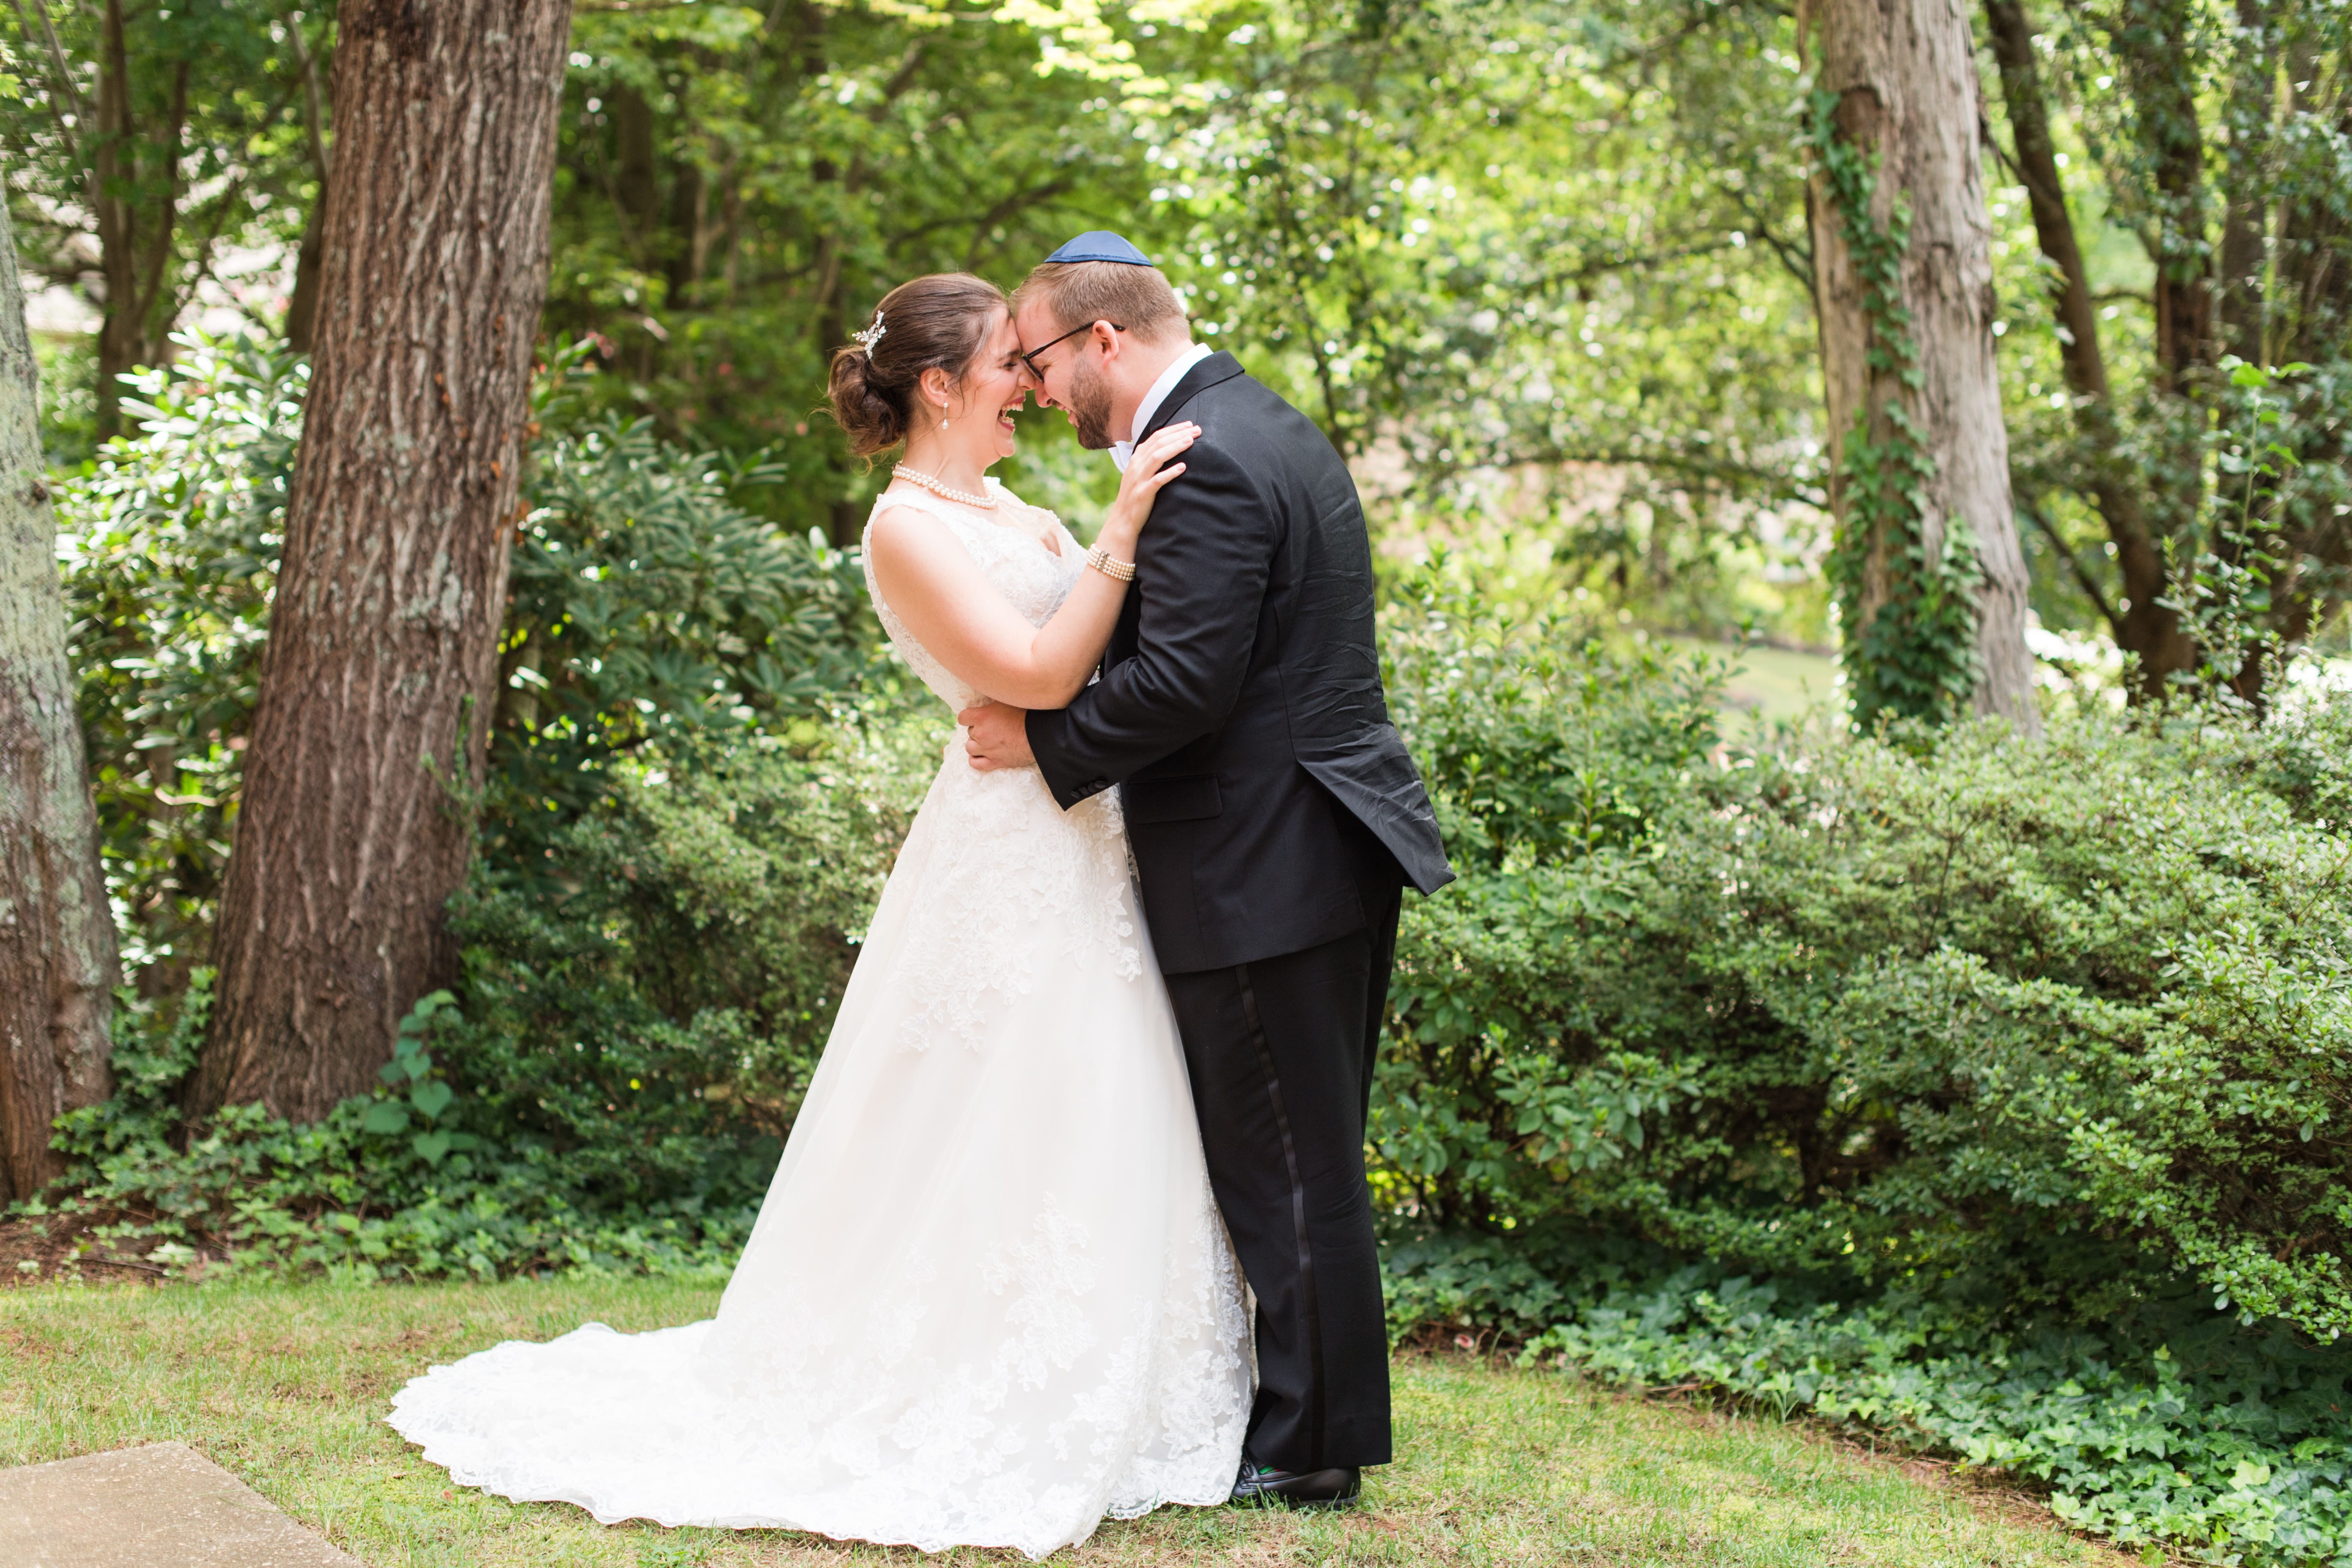 Jonathan + Melissa | Archdale, North Carolina | a private property